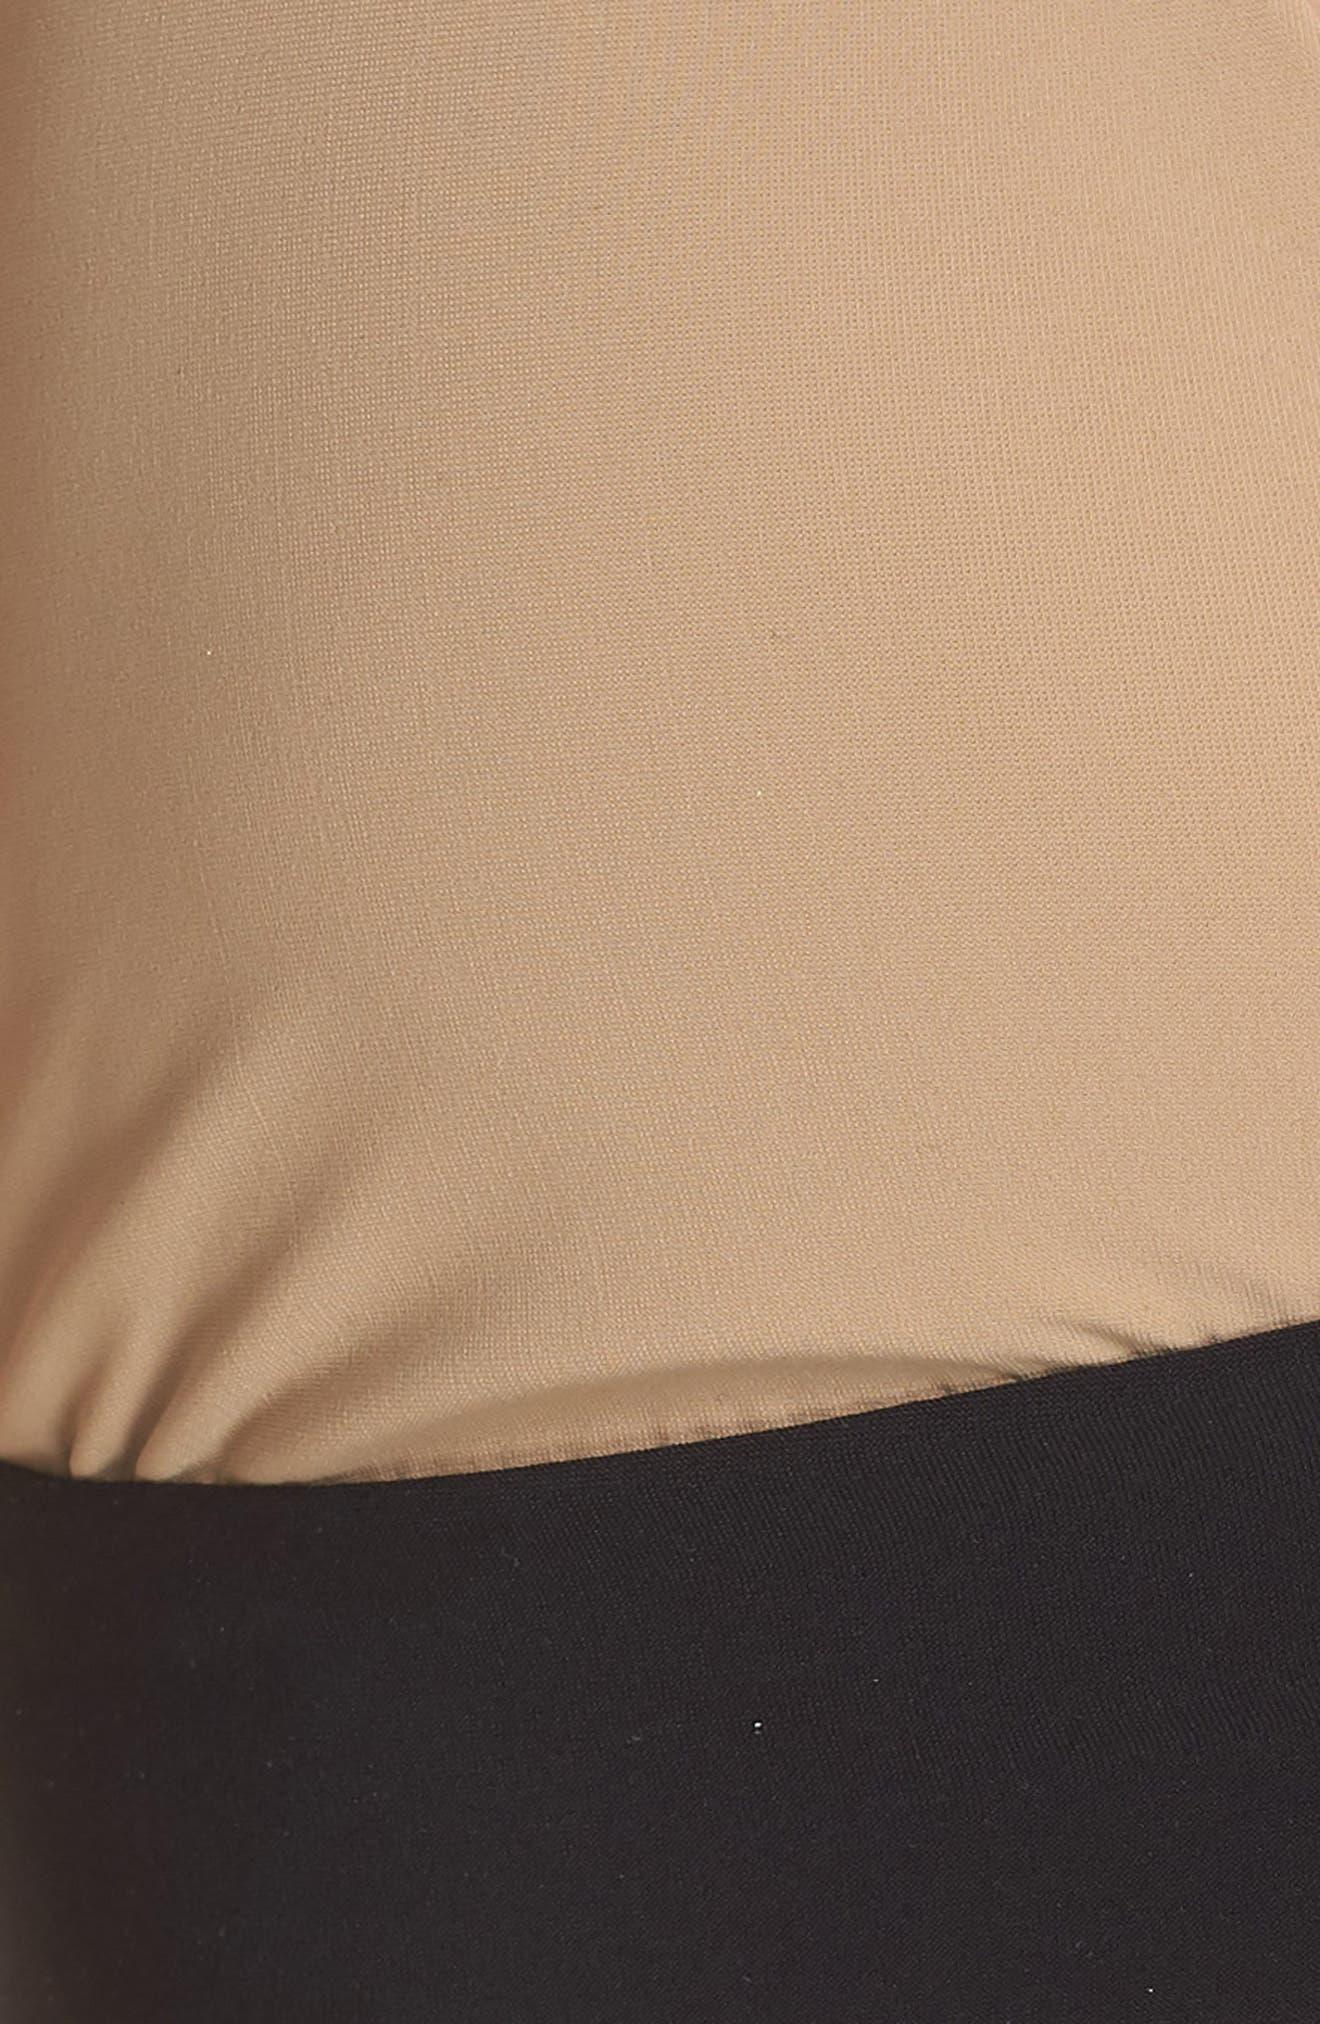 BOYS + ARROWS,                             Fillis Bikini Top,                             Alternate thumbnail 5, color,                             250